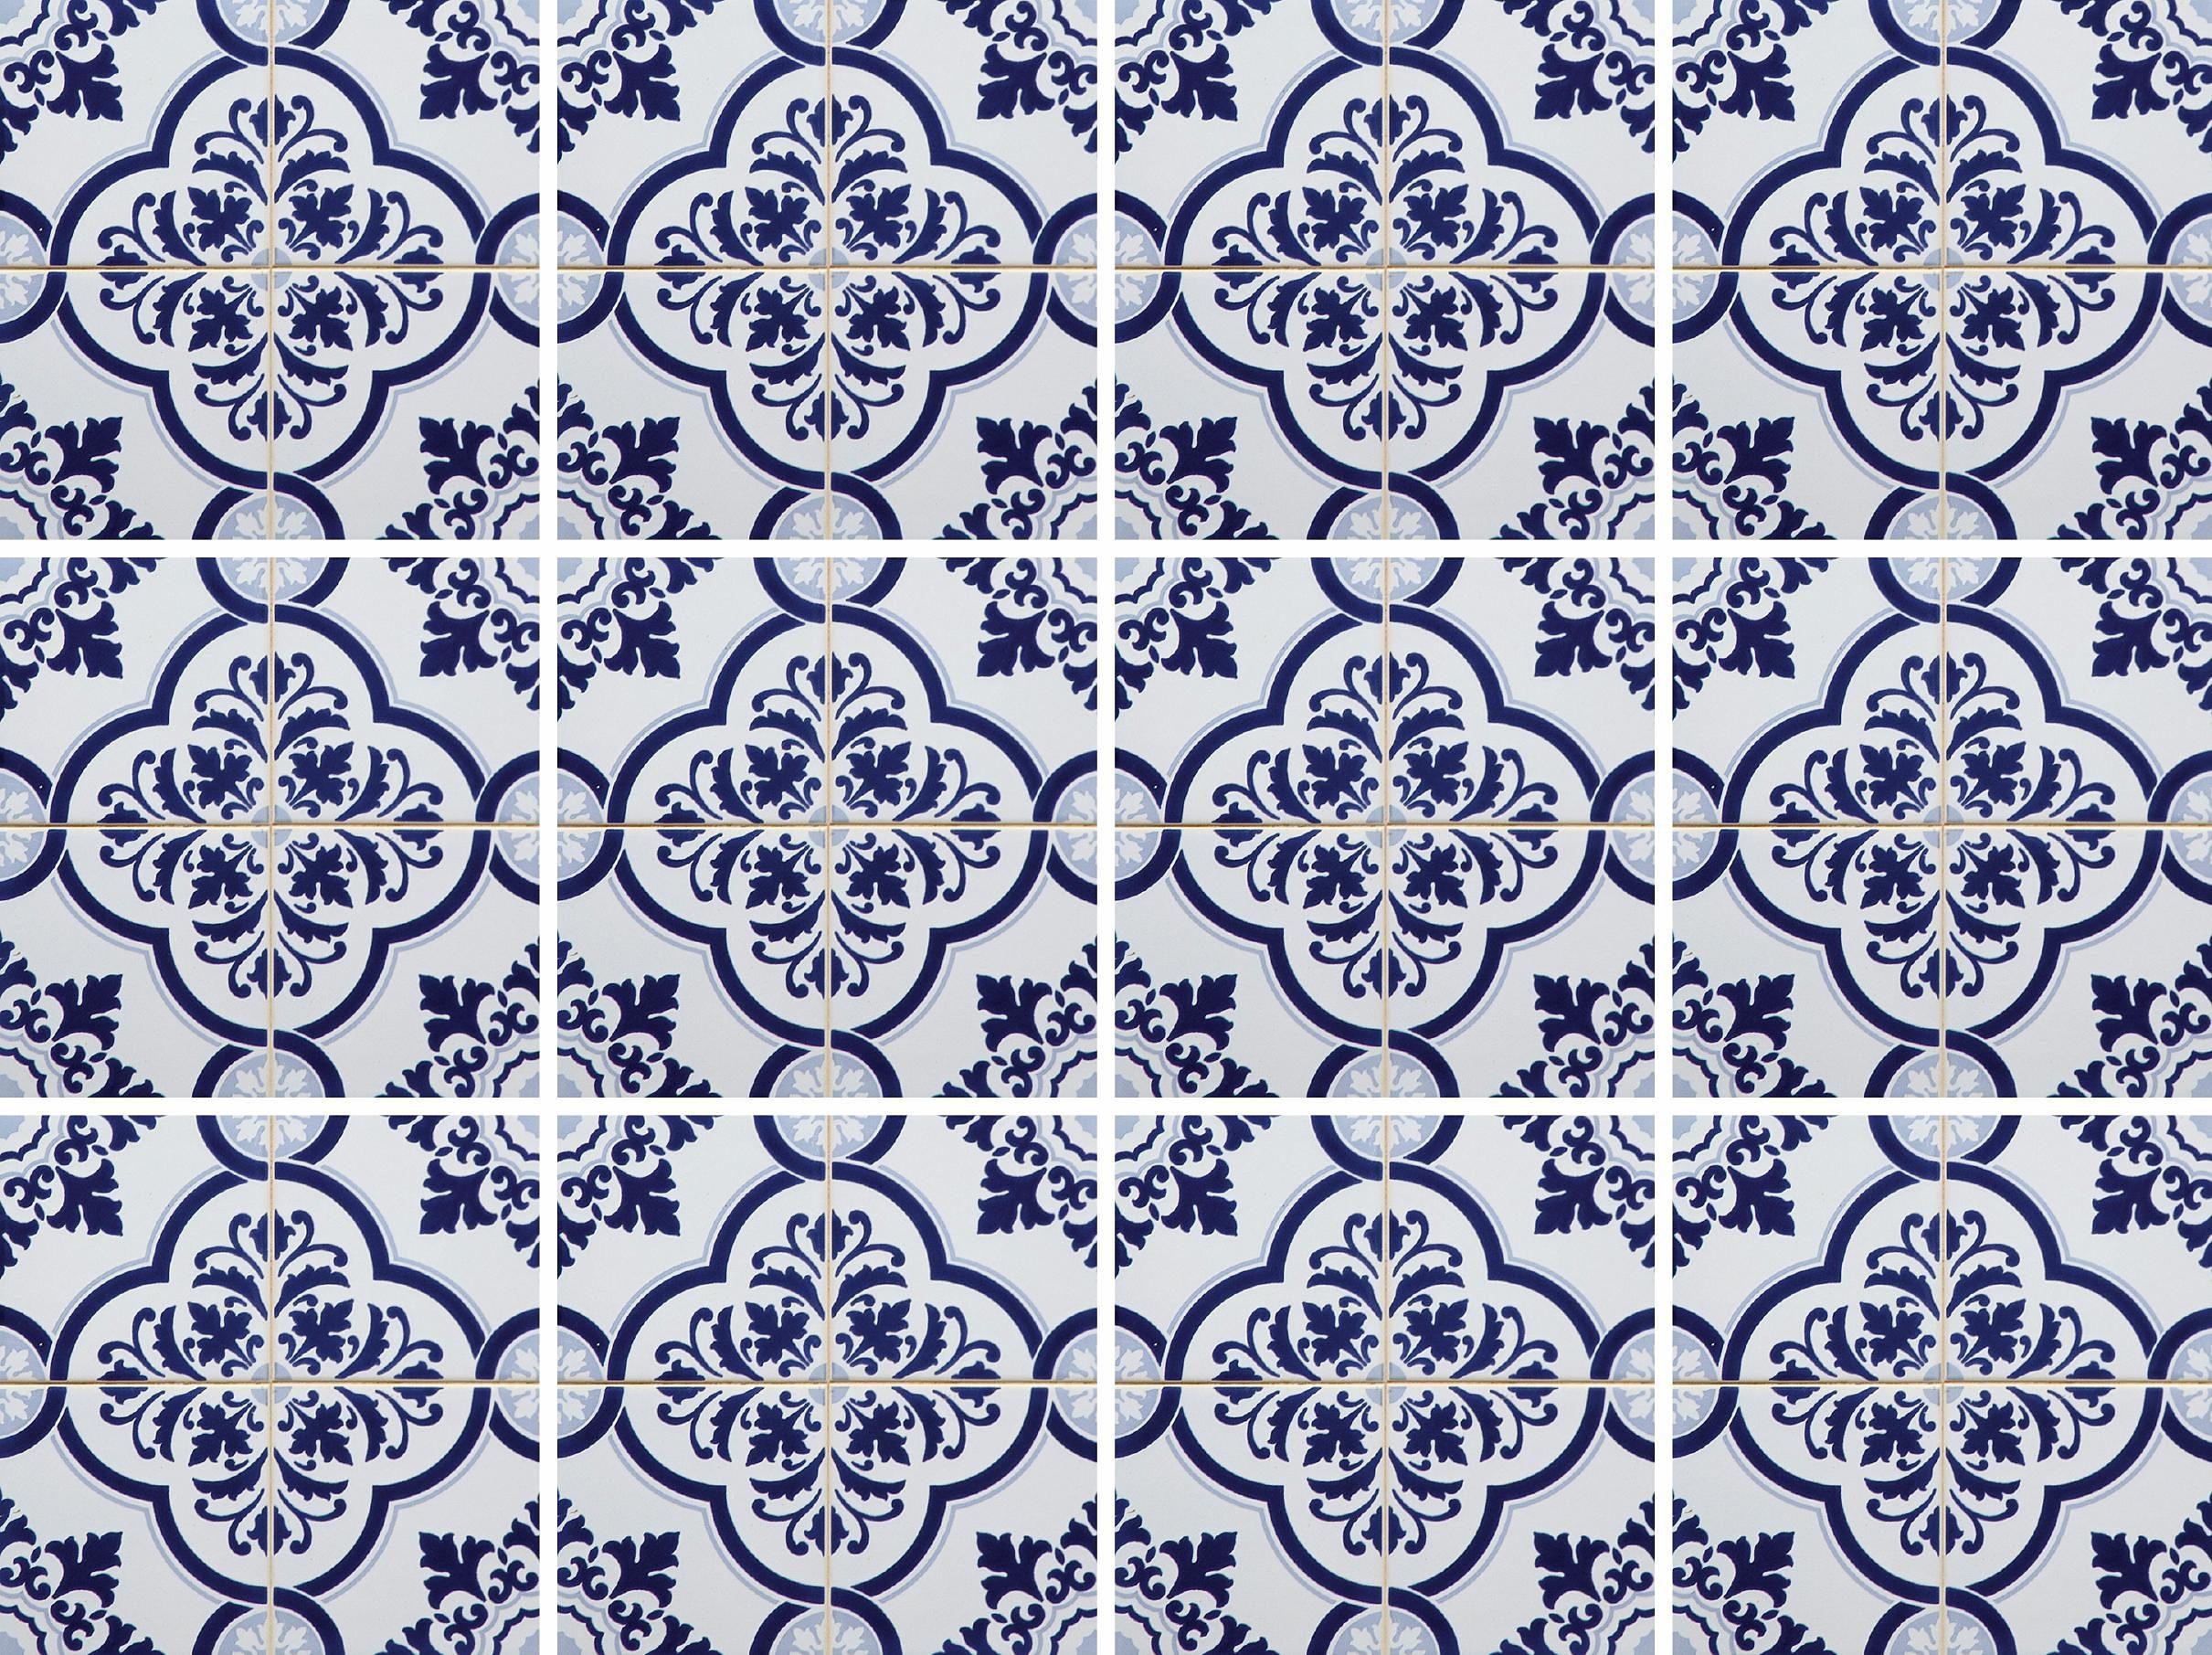 Home affaire Fliesenaufkleber »blaue Ornamente«, 12x 15/15 cm